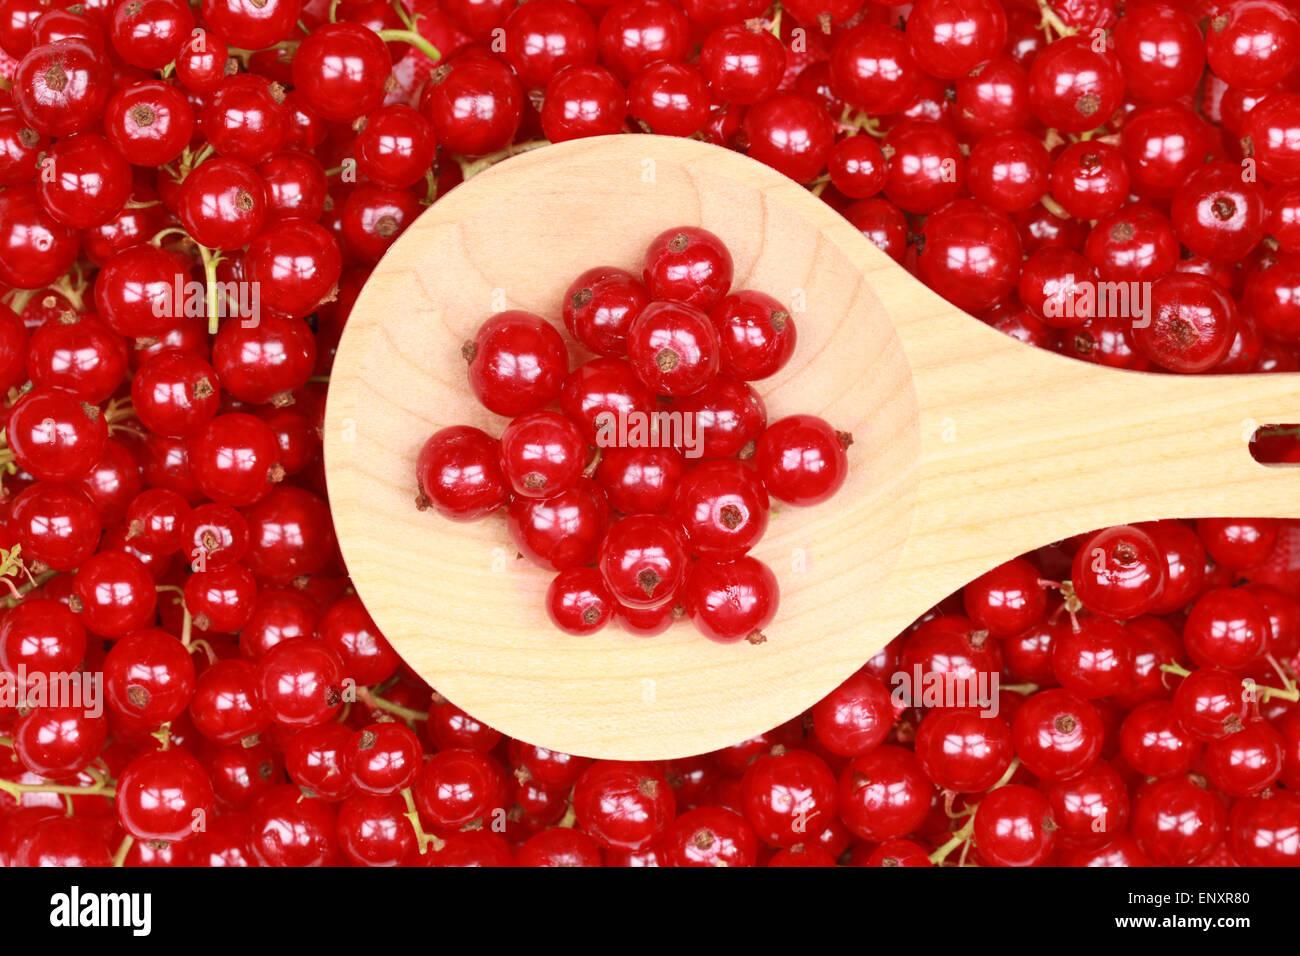 Frisch gepflückte rote Johannisbeeren Stock Photo